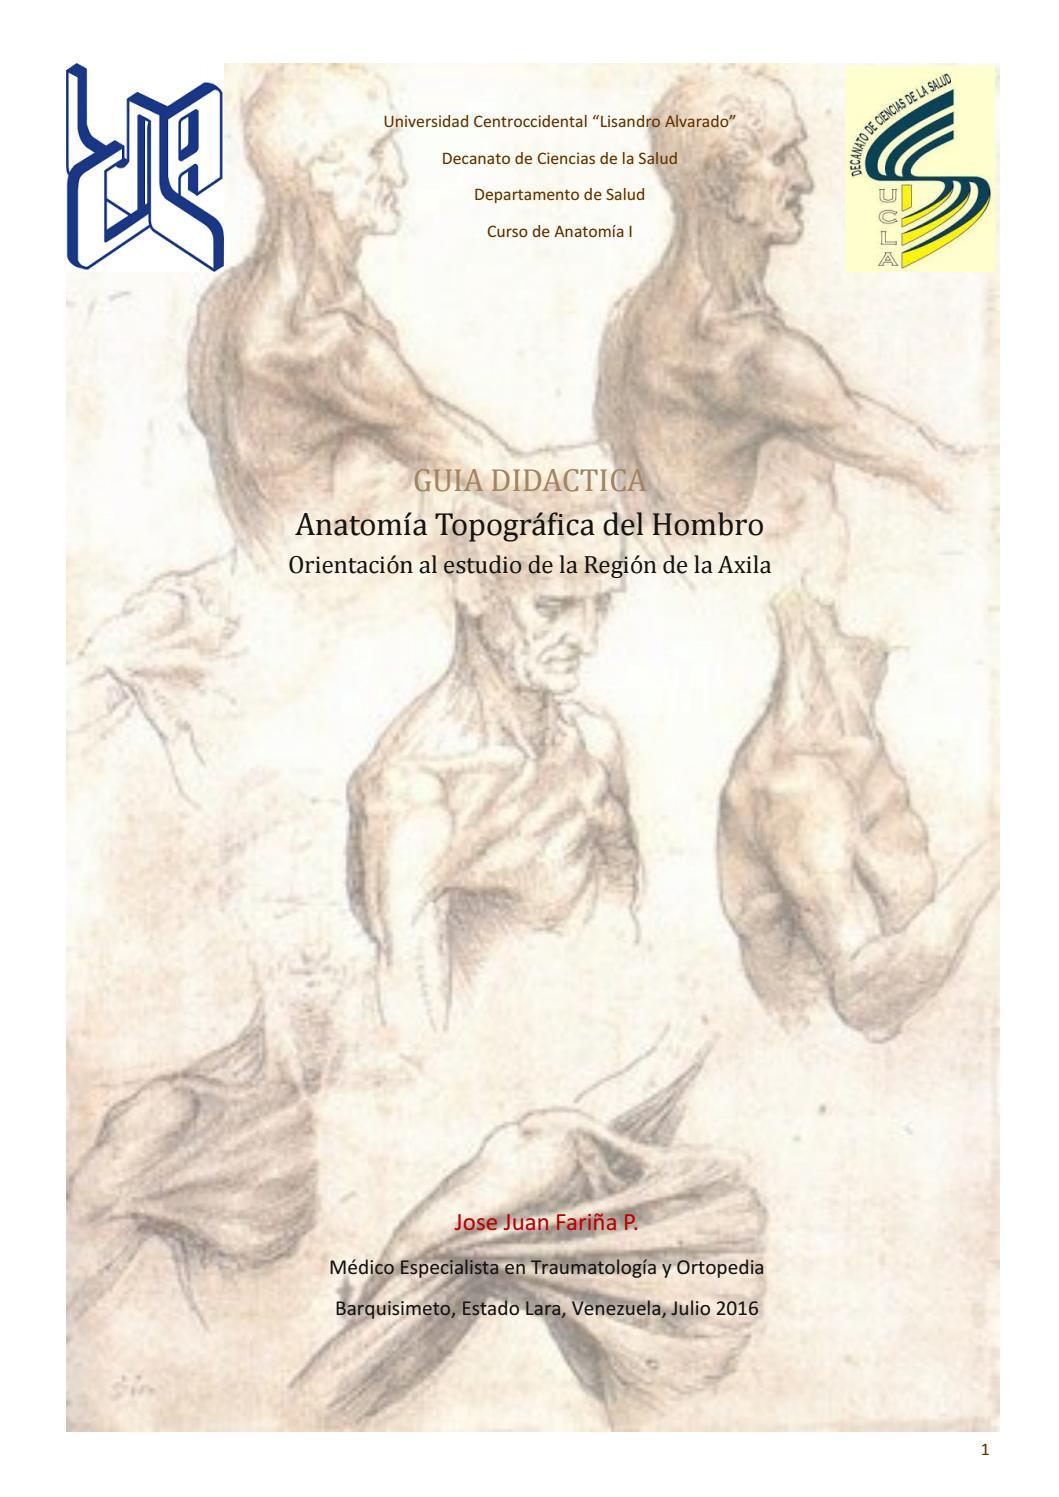 Guía Didáctica de Hombro by jjfarina - issuu